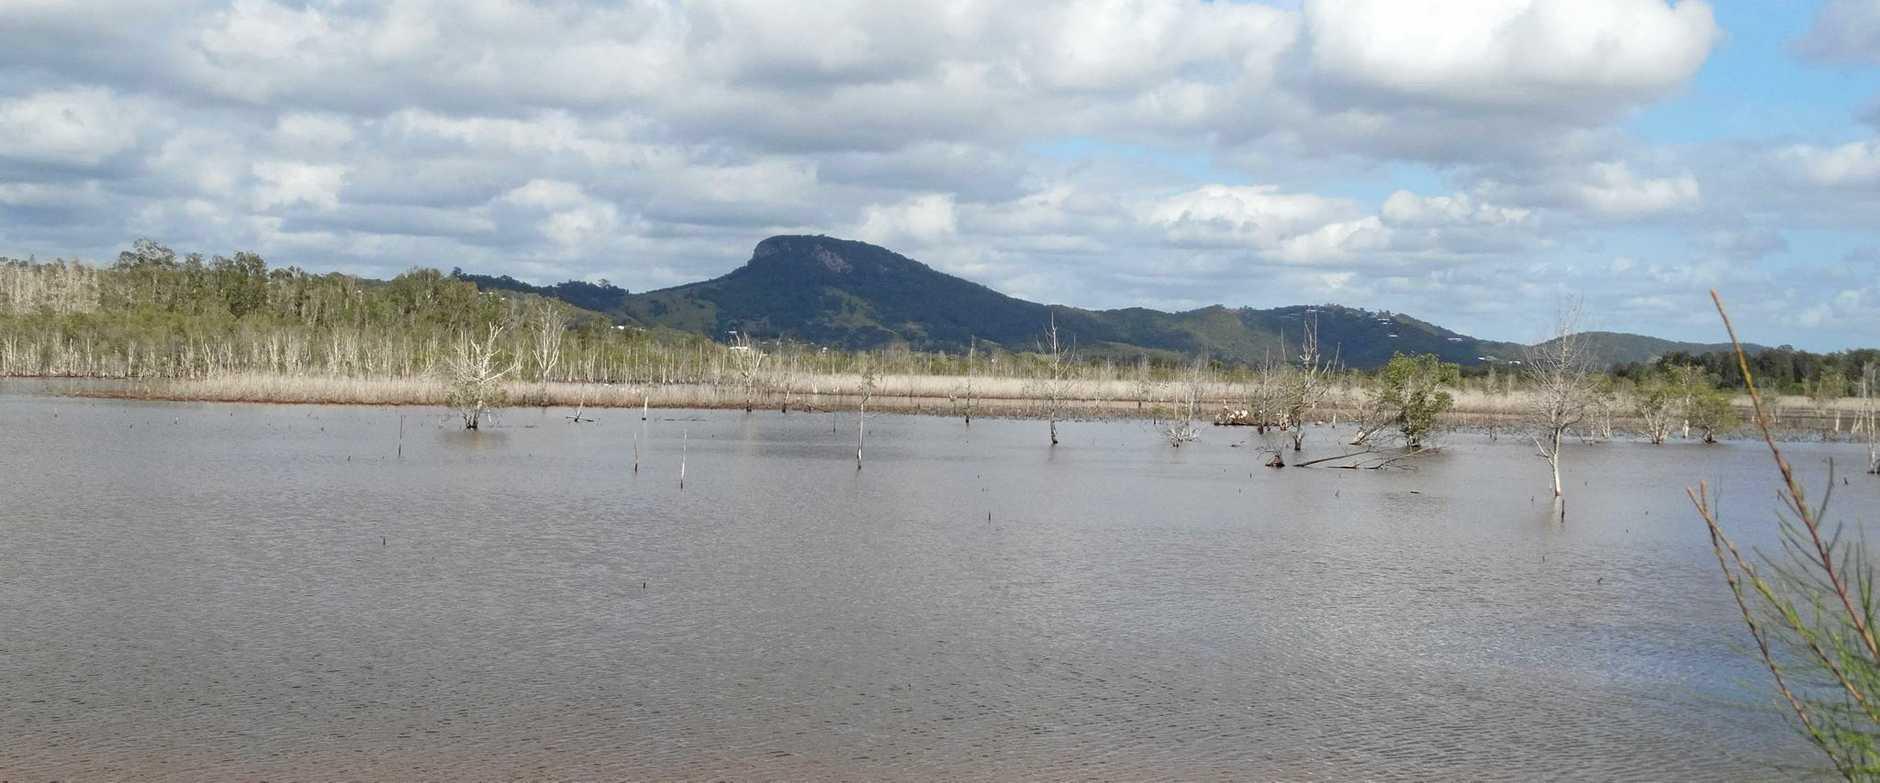 Yandina Creek Wetlands looking towards Mt Ninderry.